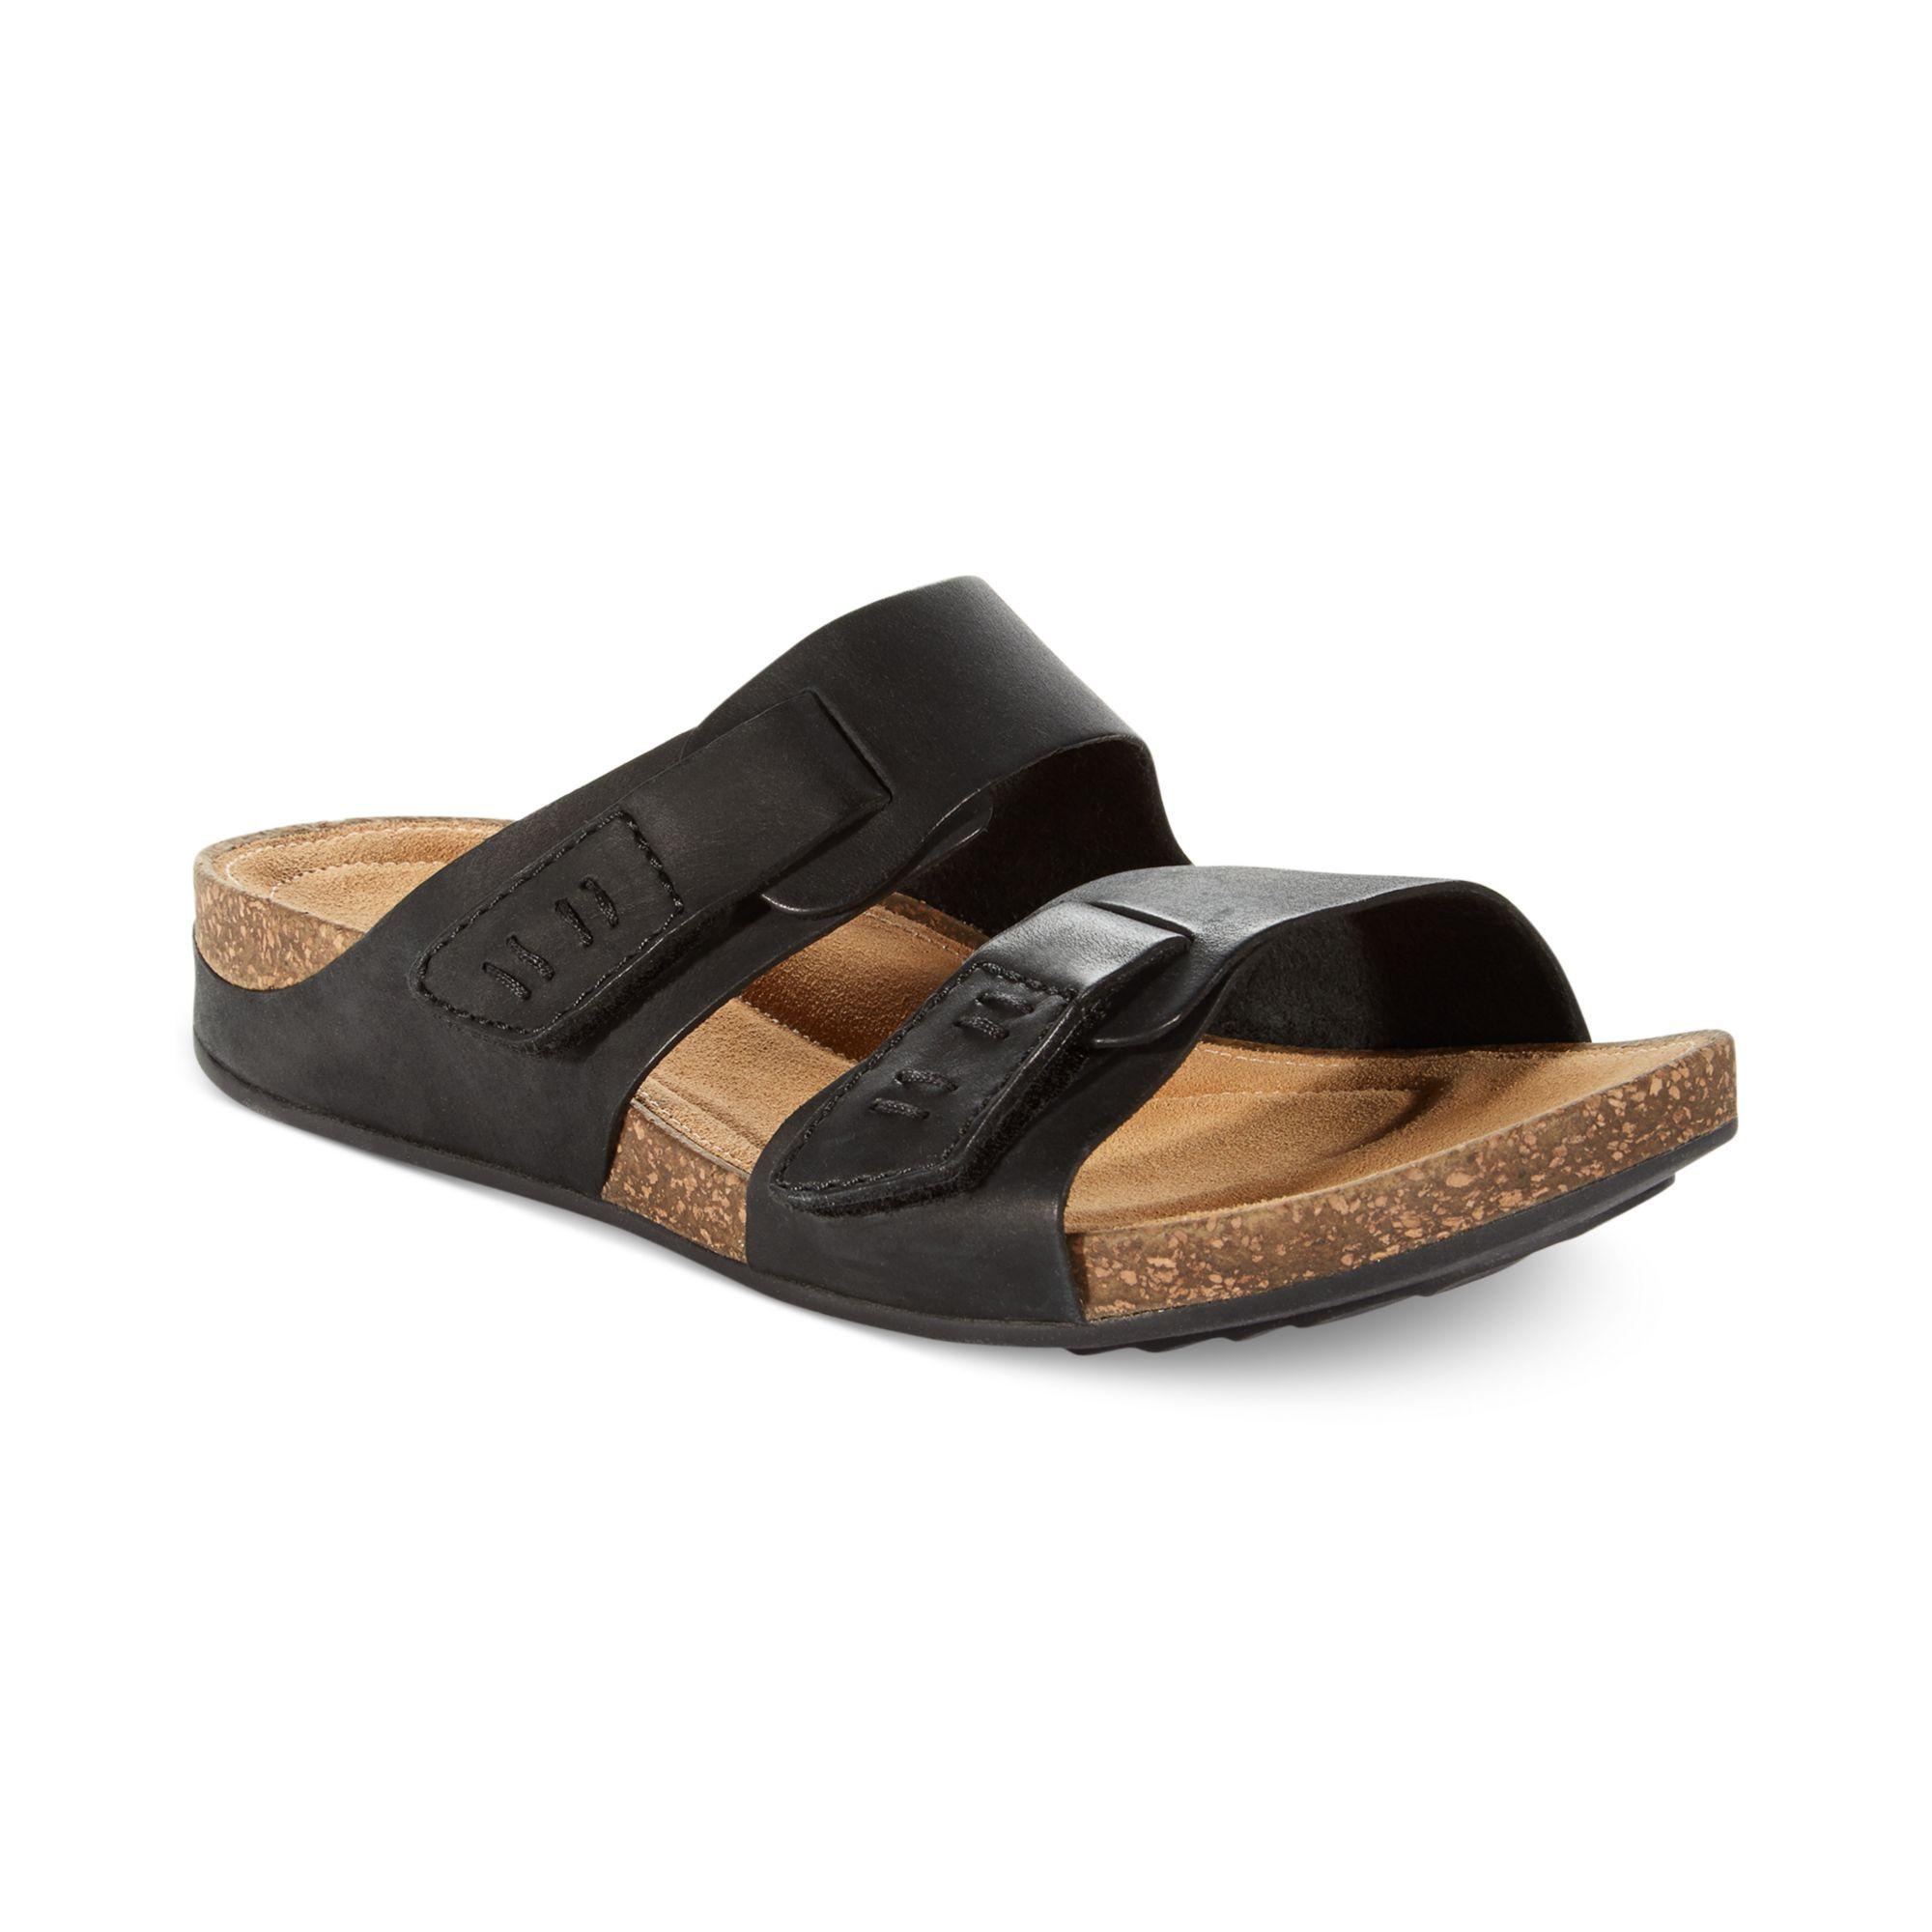 Clarks Womens Artisan Perri Island Footbed Sandals In